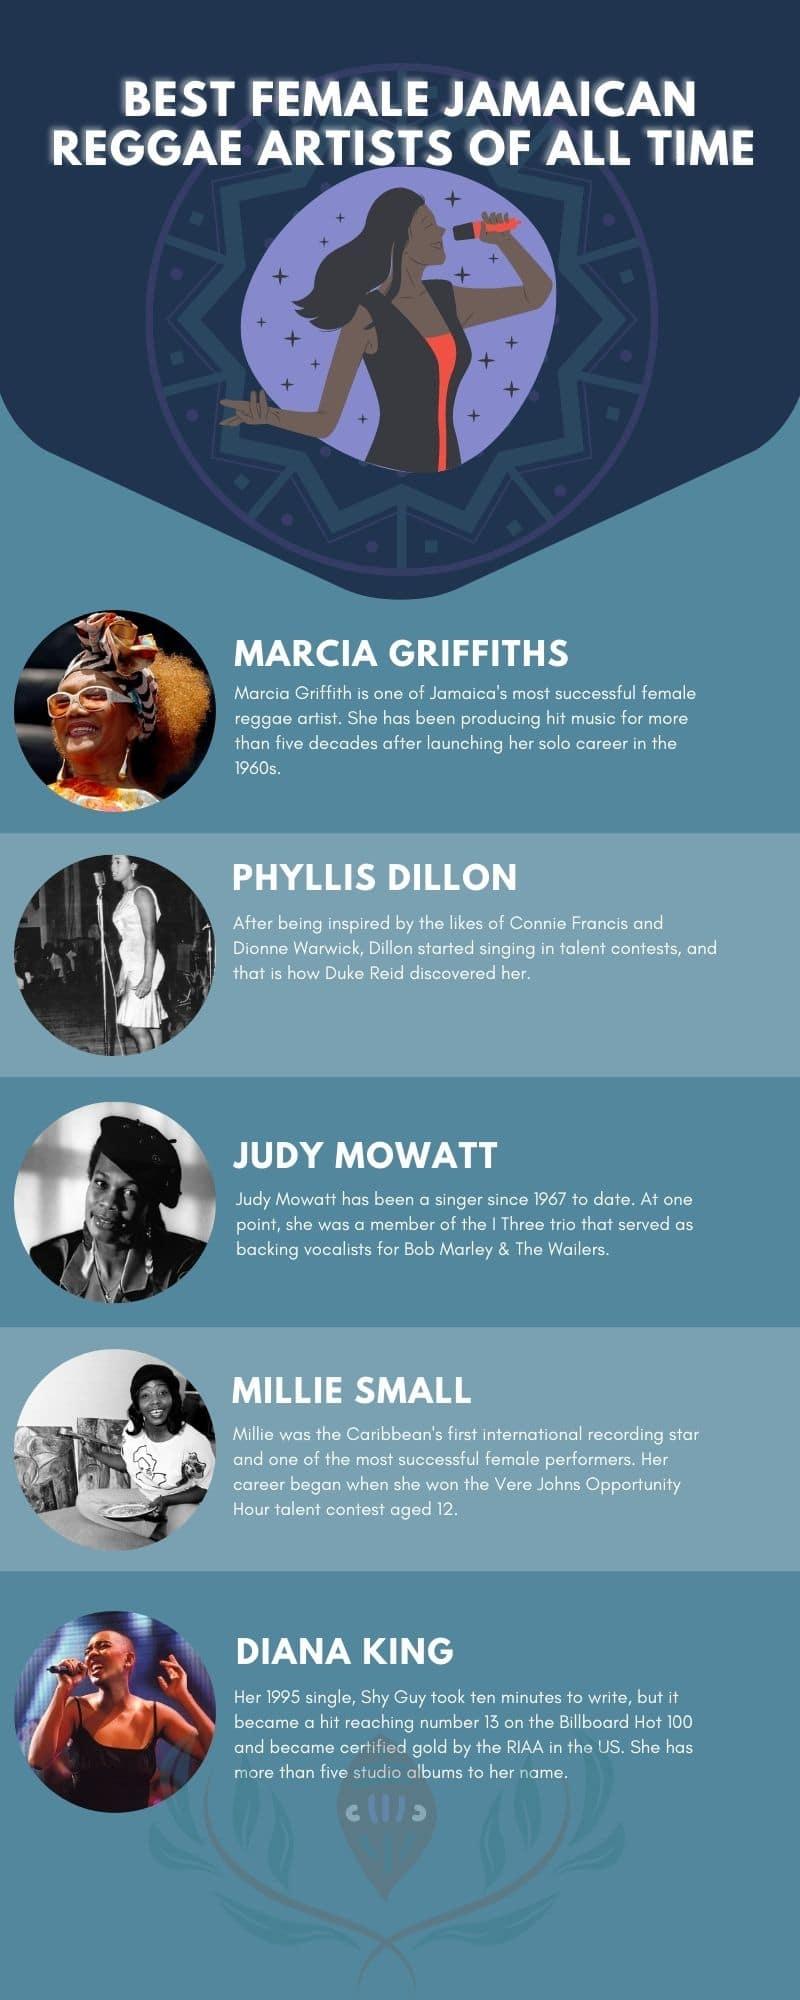 best female Jamaican Reggae artists